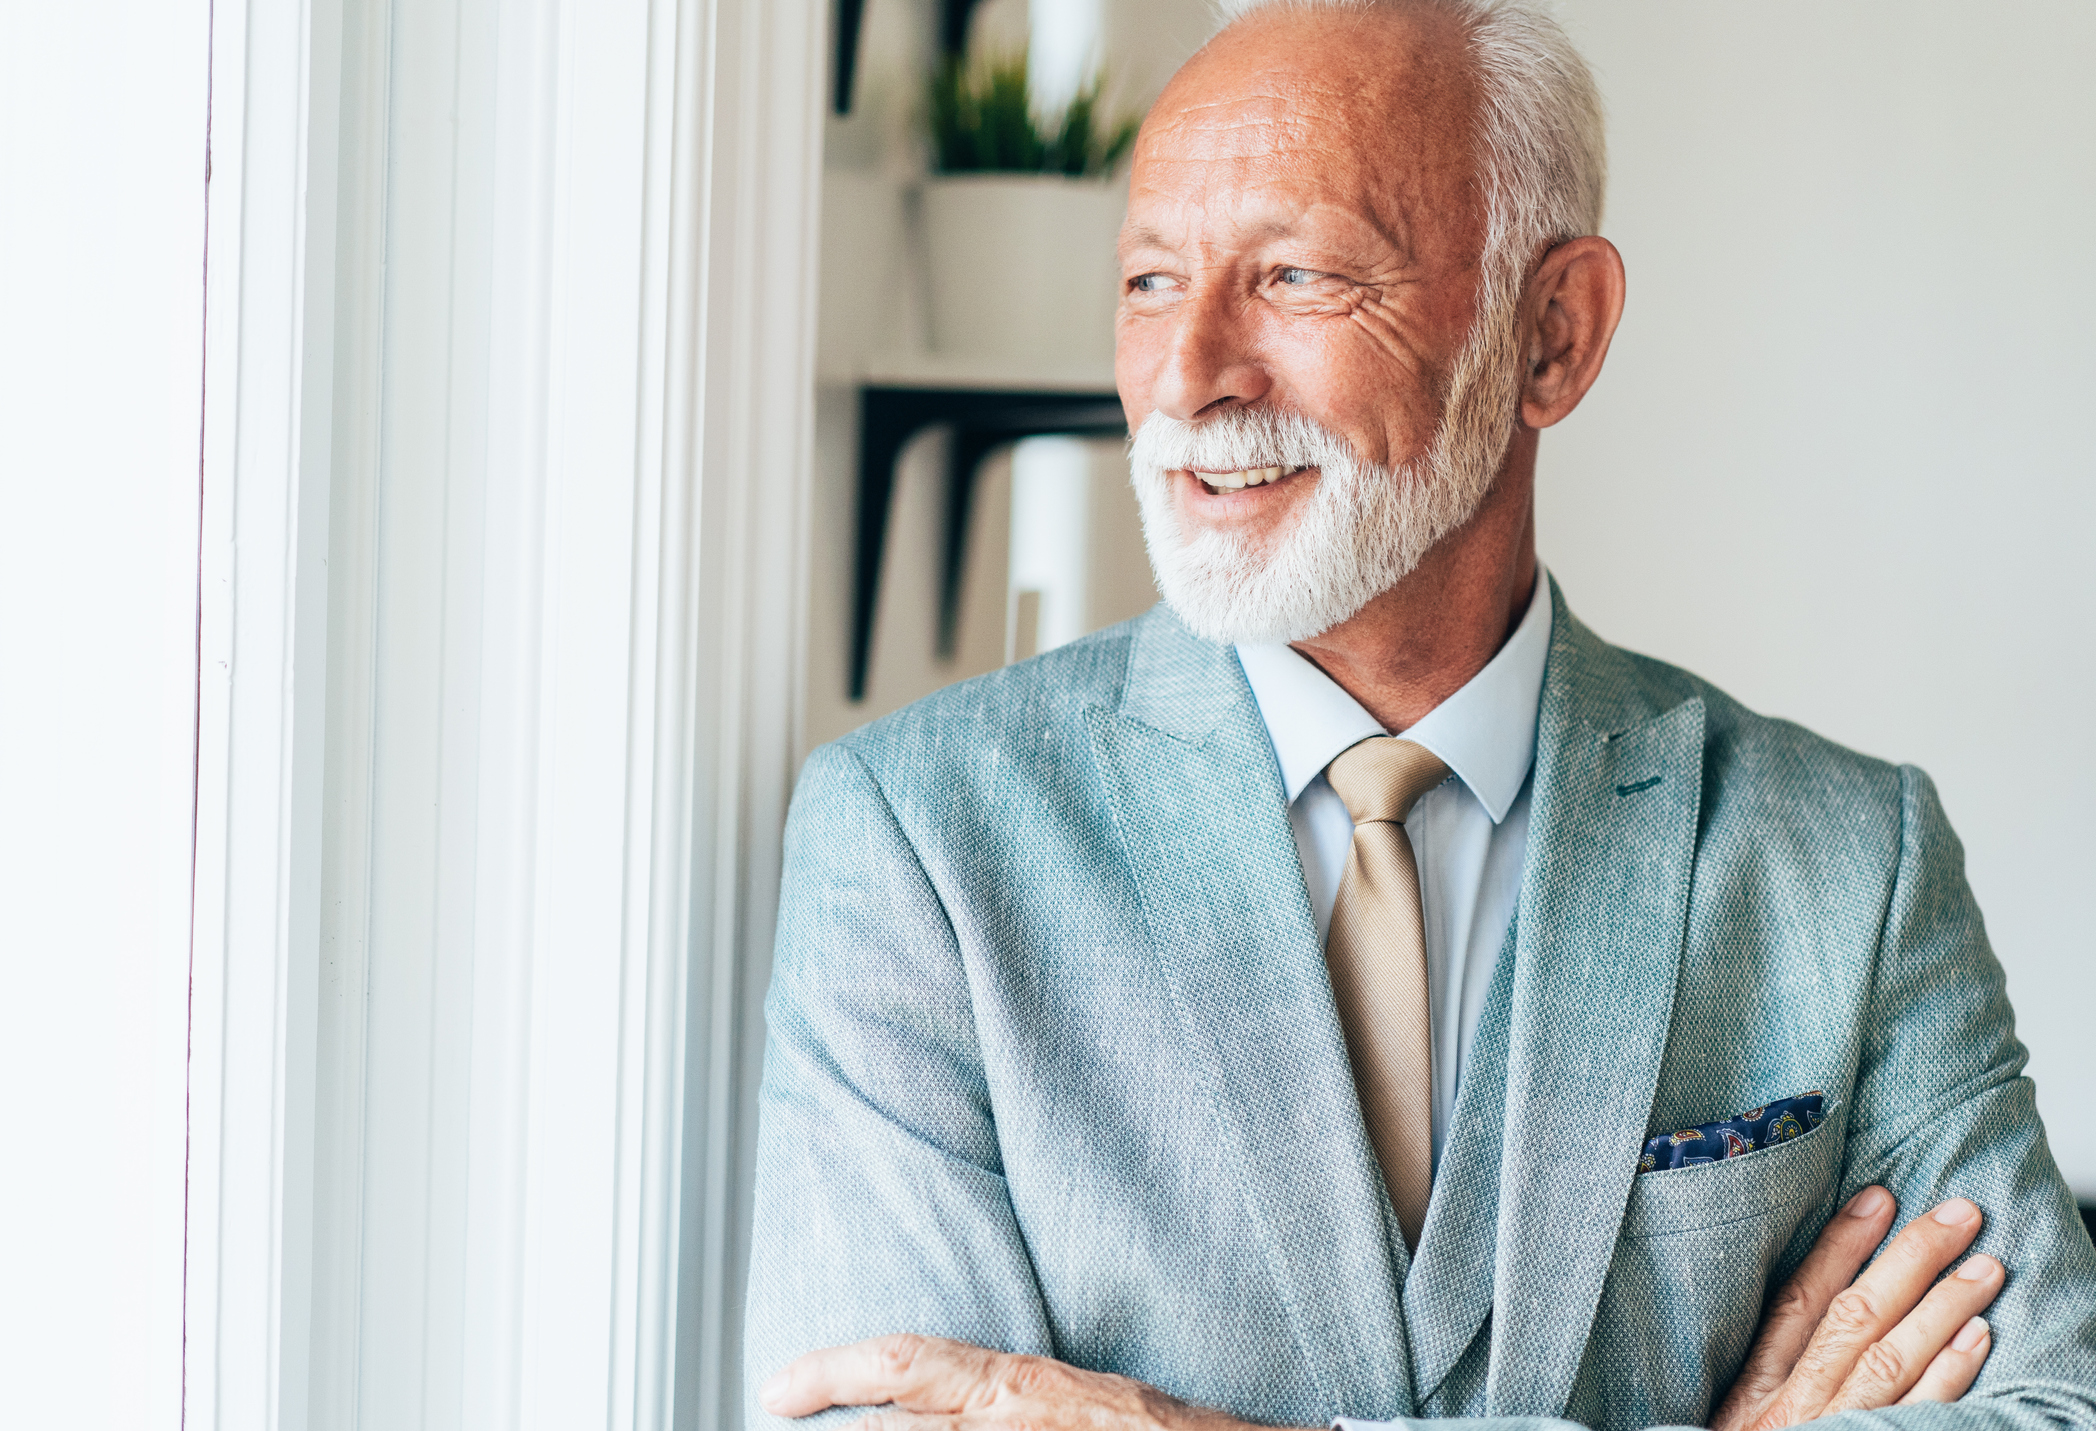 Mature Man Wearing a Grey Suit